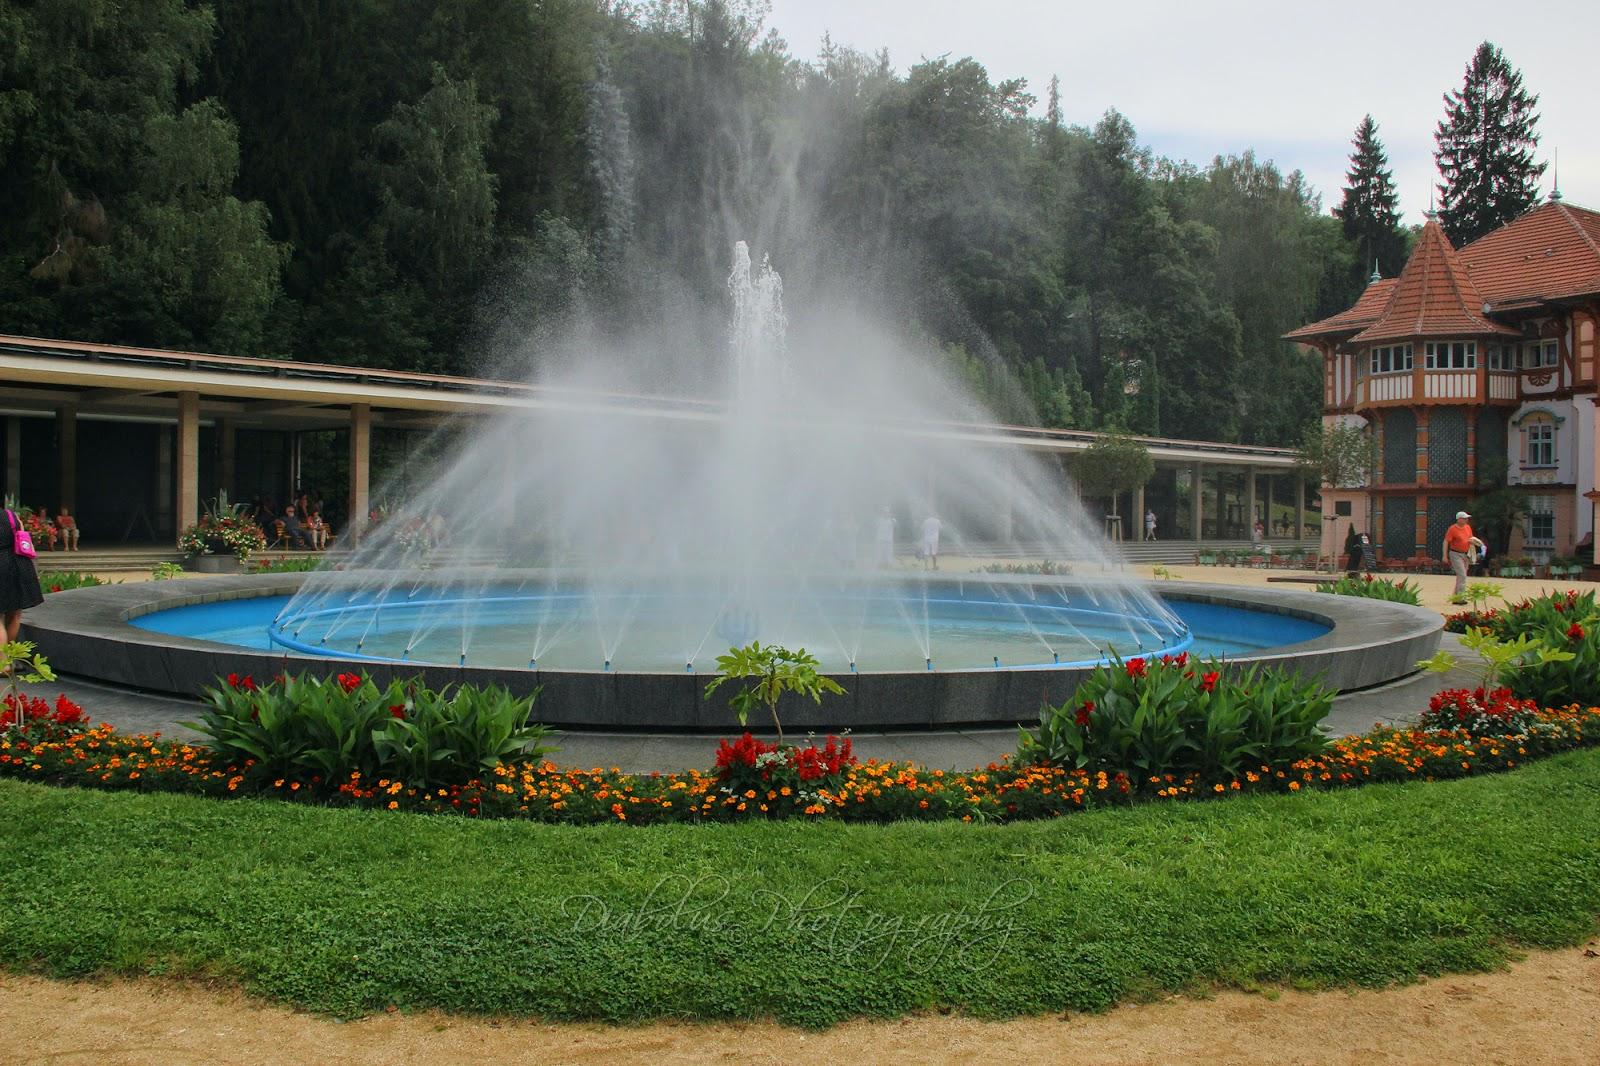 Fontána na kolonádě v Luhačovicích/The Fountain in Collonade in Luhačovice